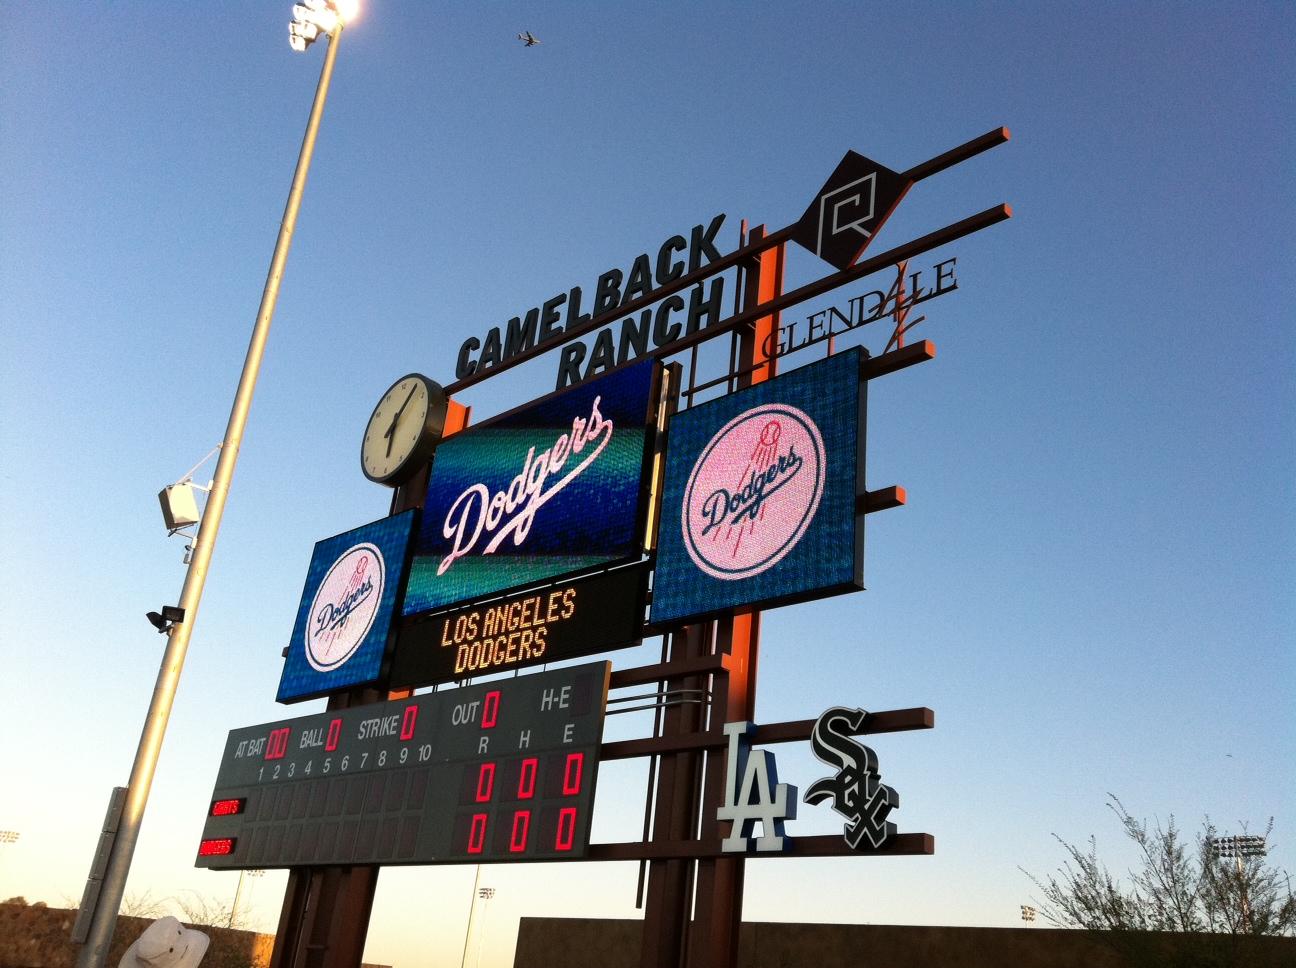 scoreboard at Camel Back Ranch